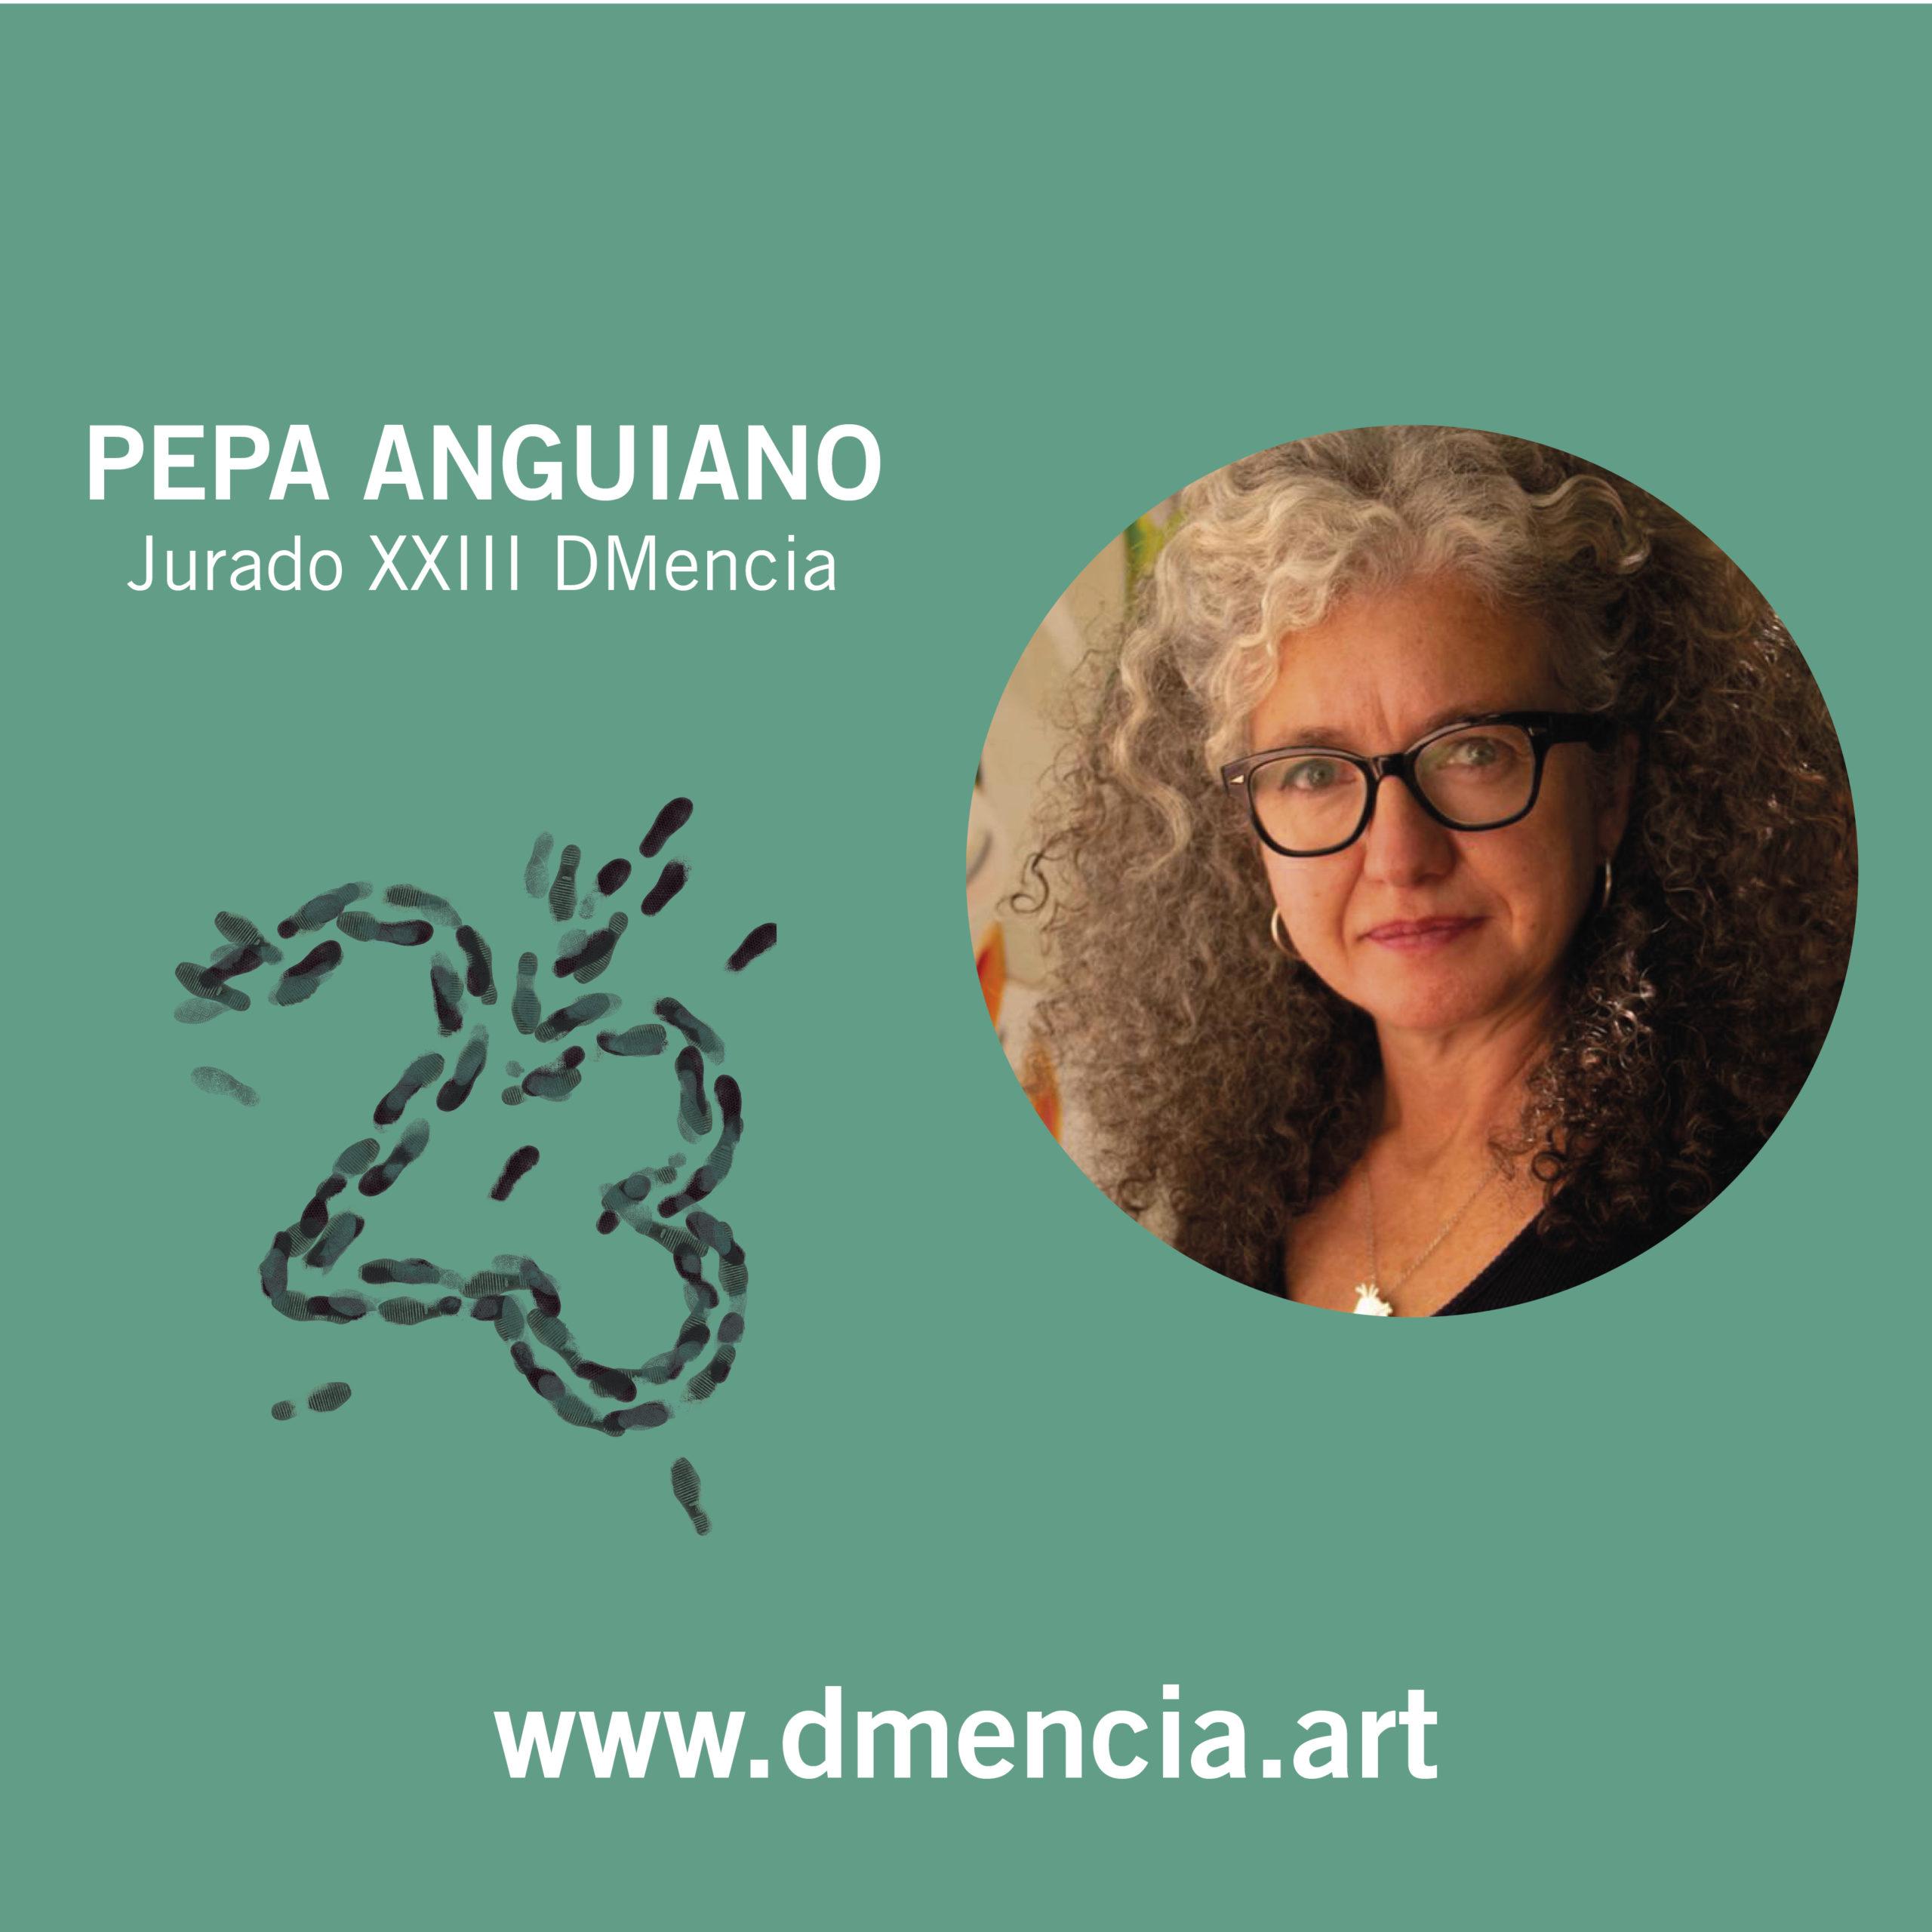 Pepa Anguiano - DMencia 2021